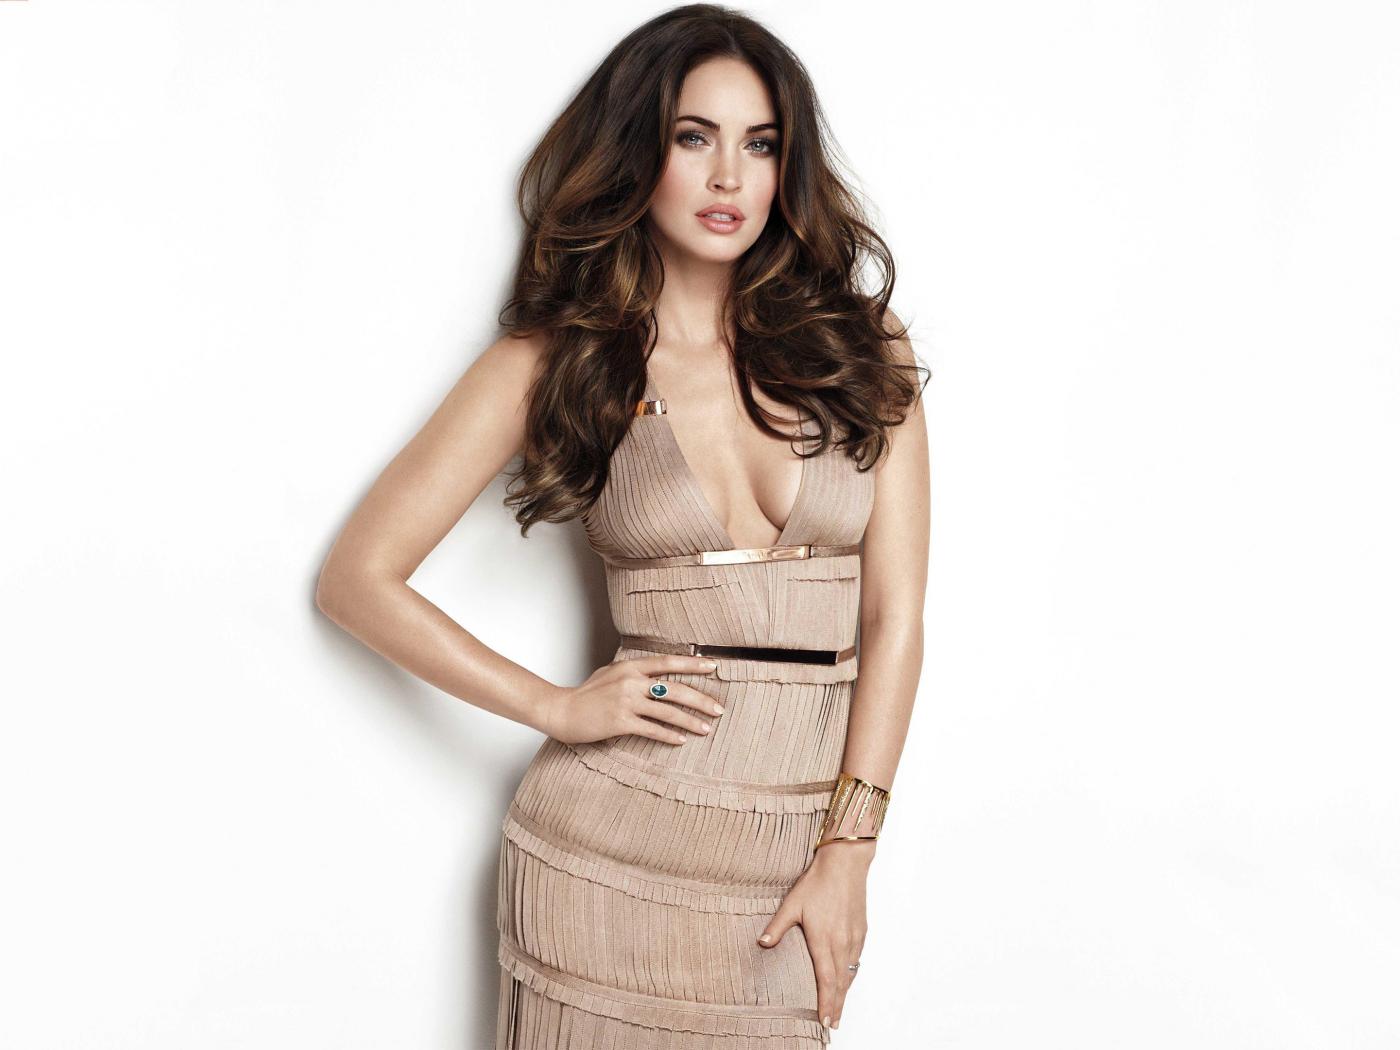 Megan fox, hot model, actress, celebrity, 1400x1050 wallpaper